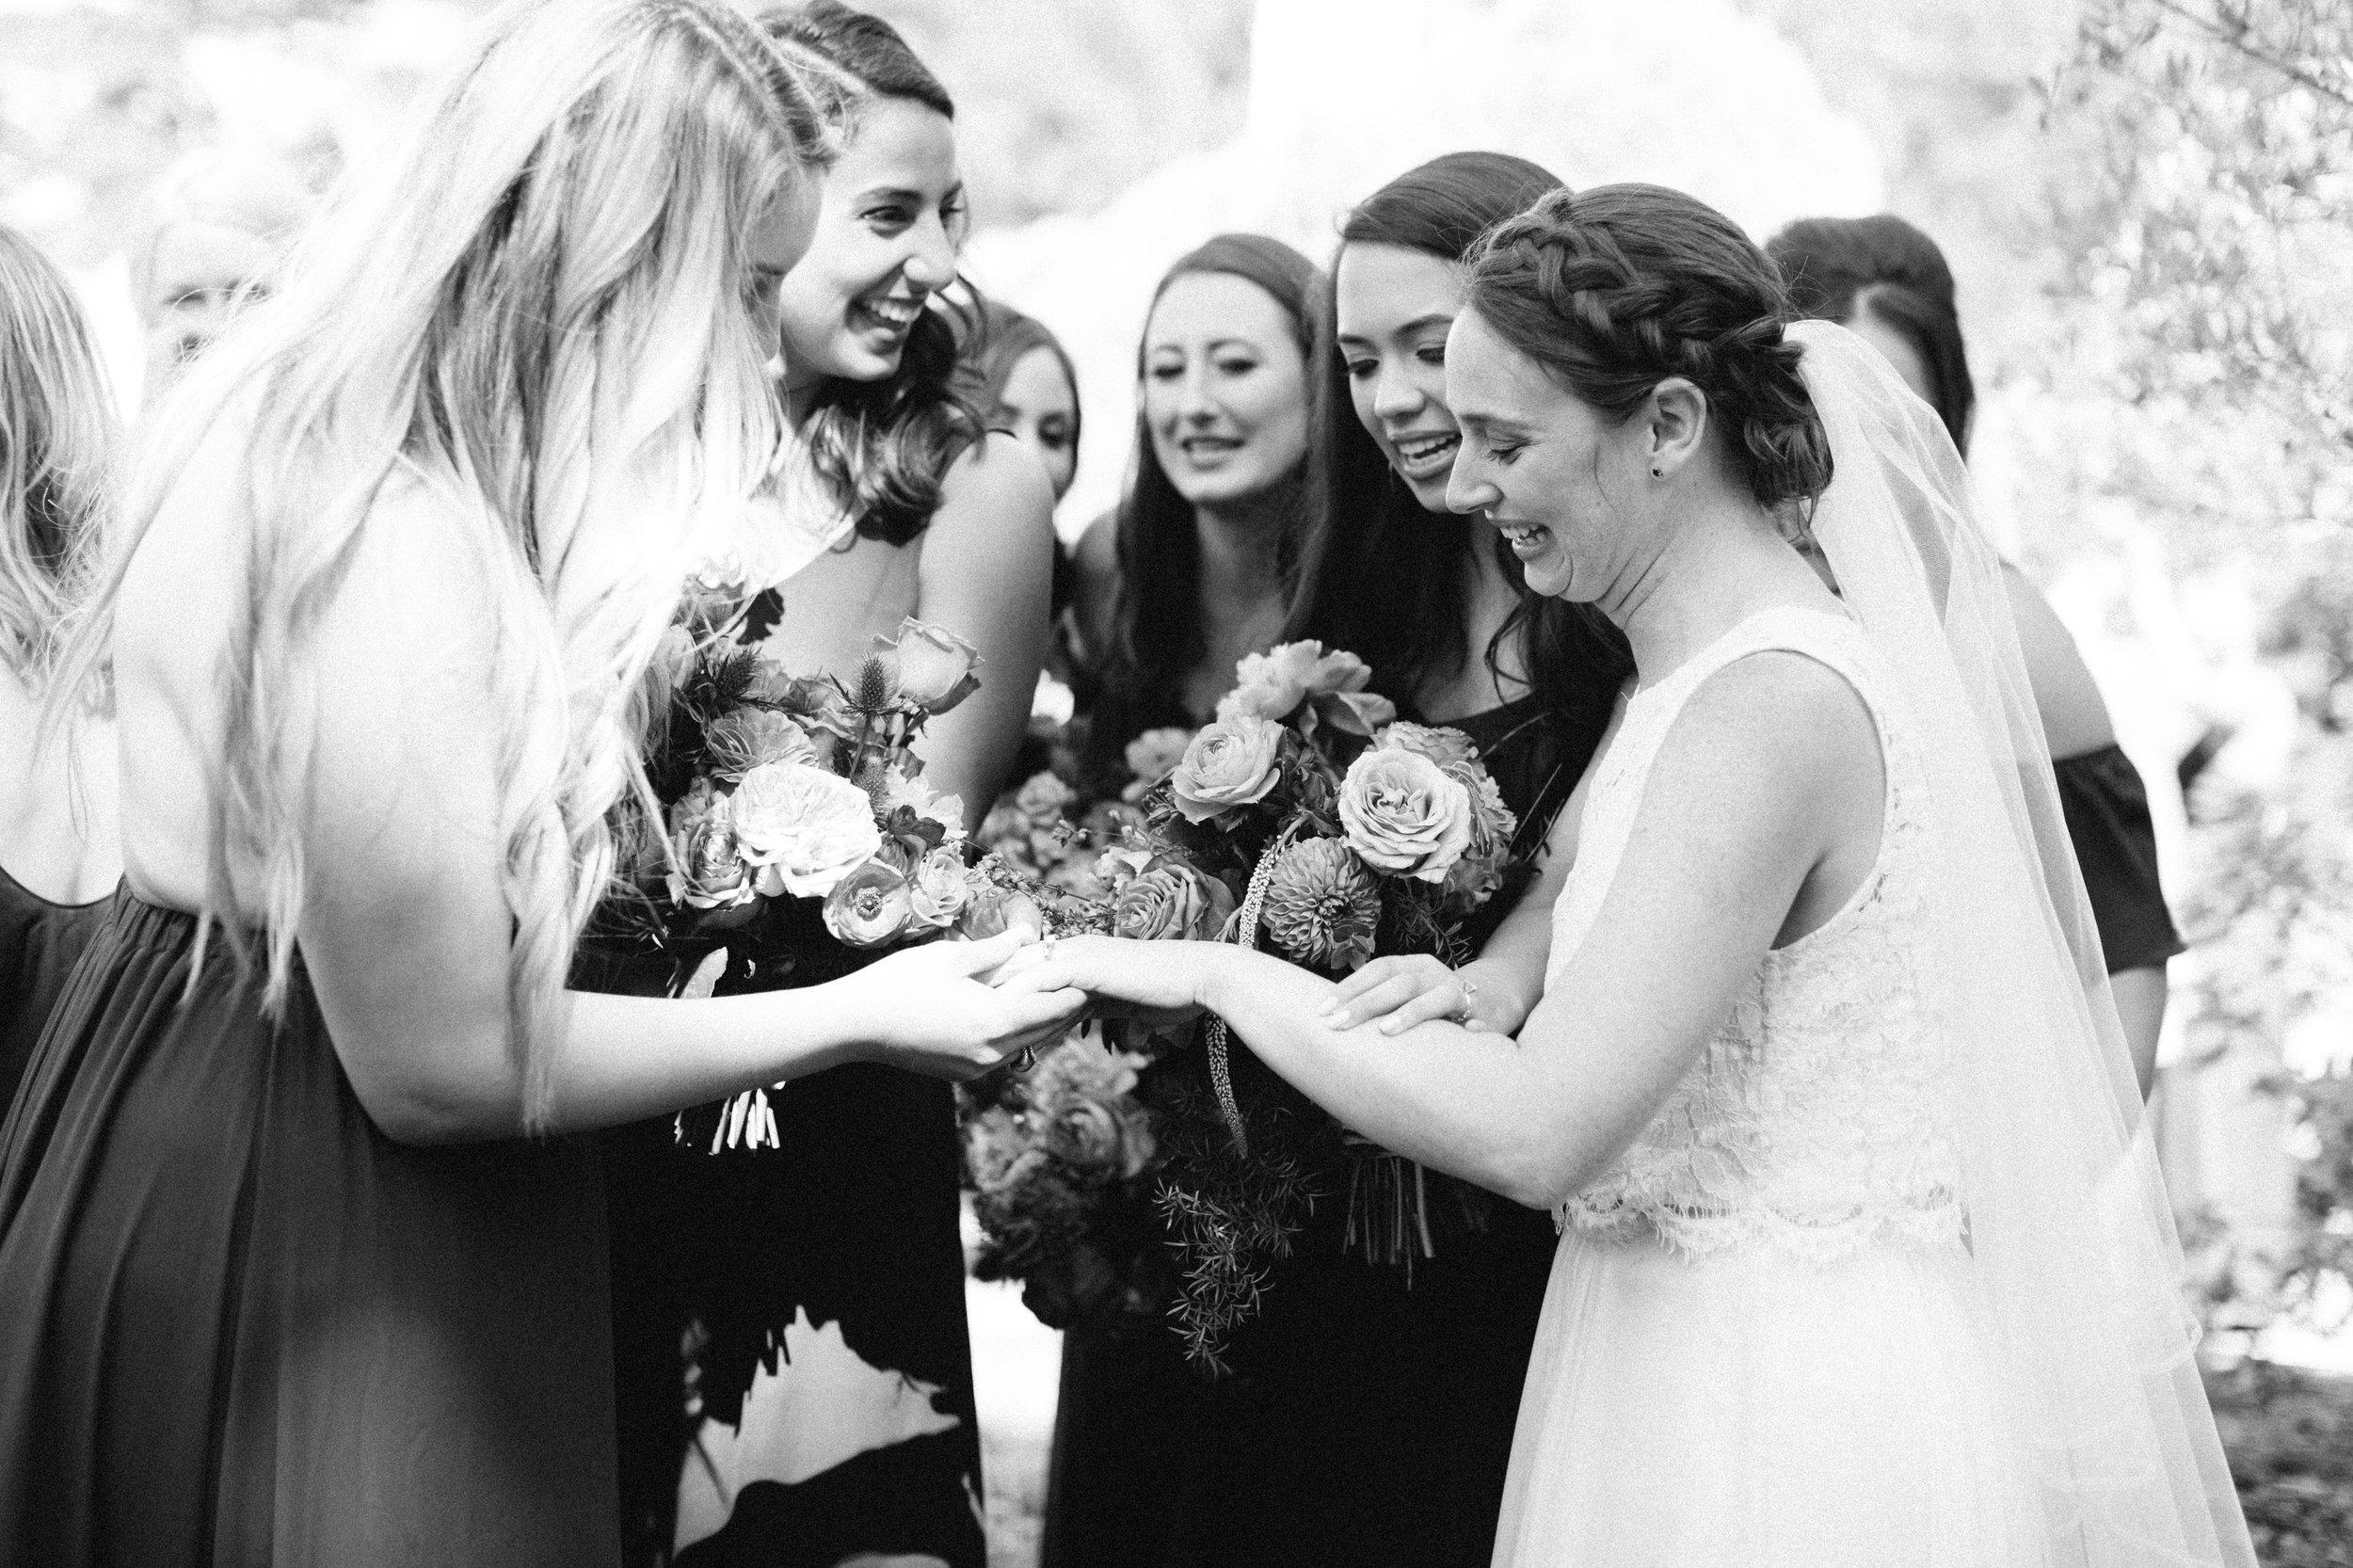 Tucker_Kristina_Wedding_Presidio_San_Francisco_Abigail_Malone_Photography-724.jpg